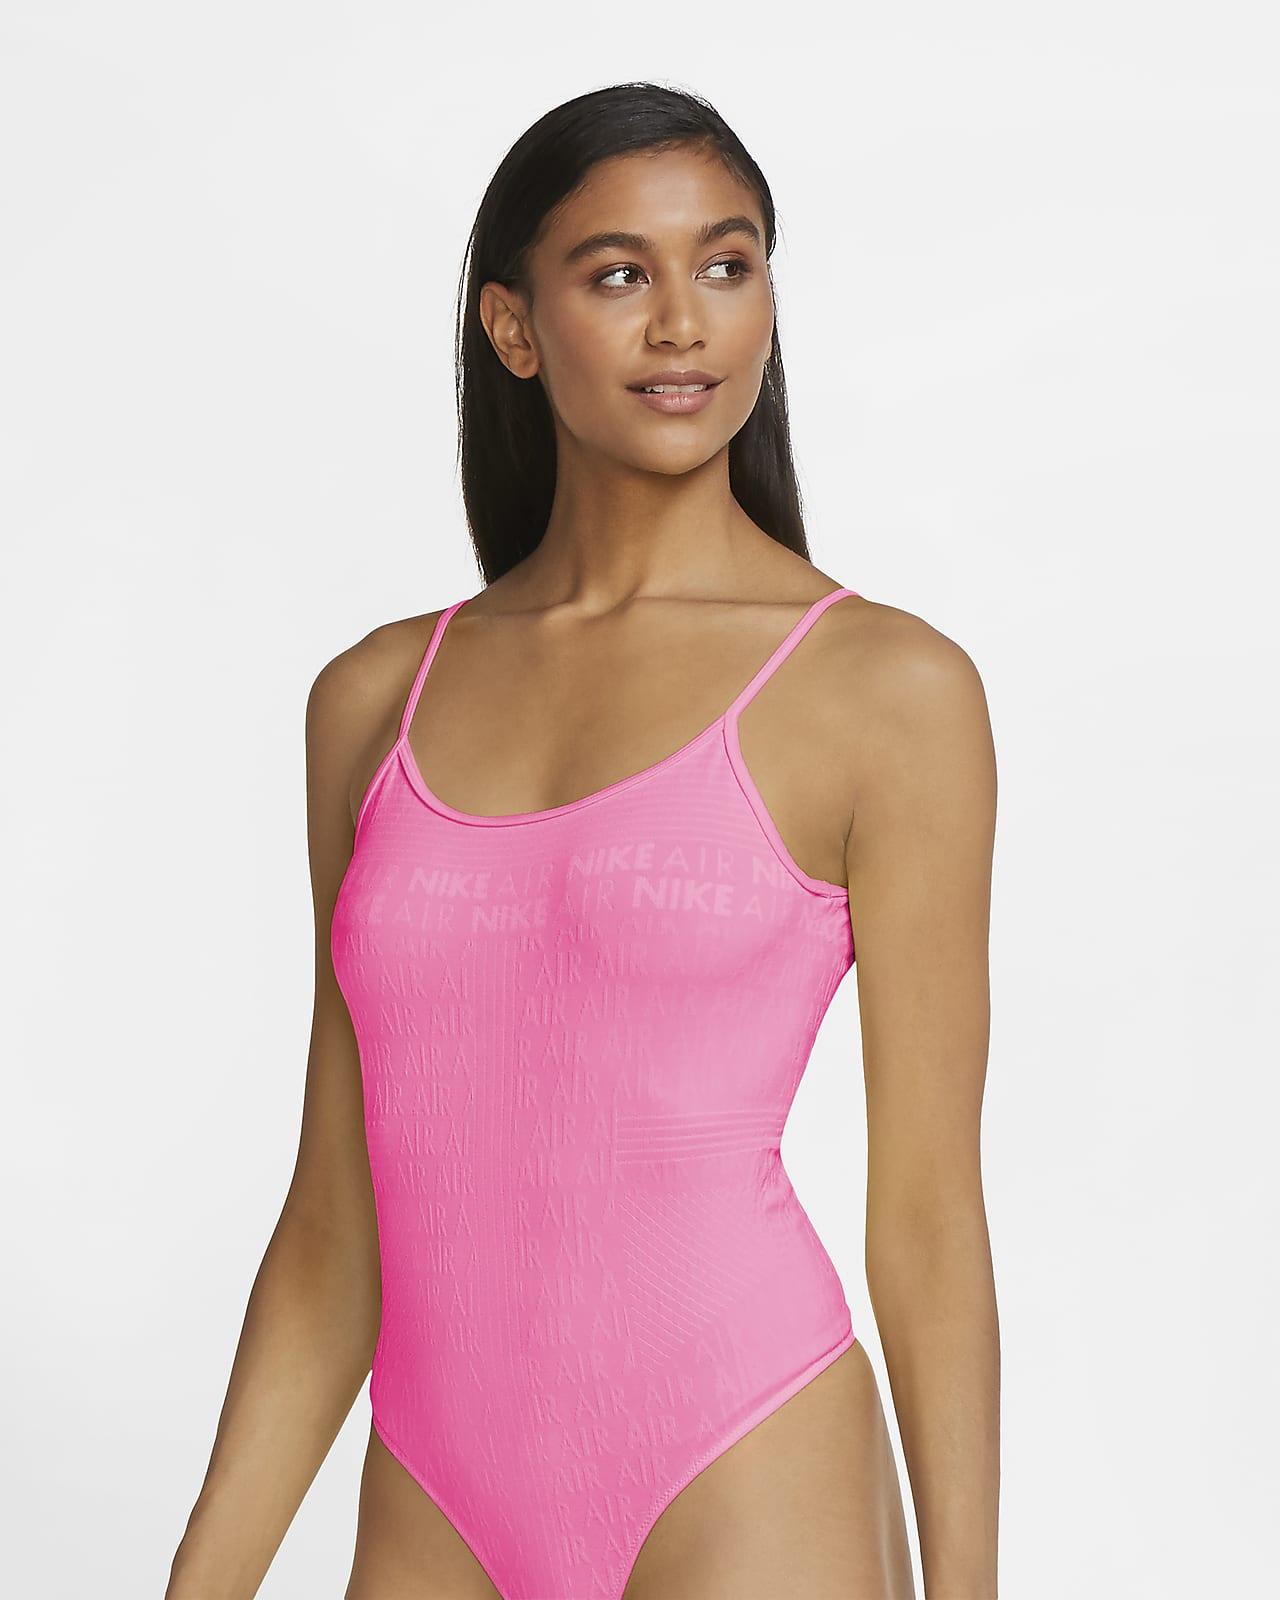 Nike Air Body - Mujer